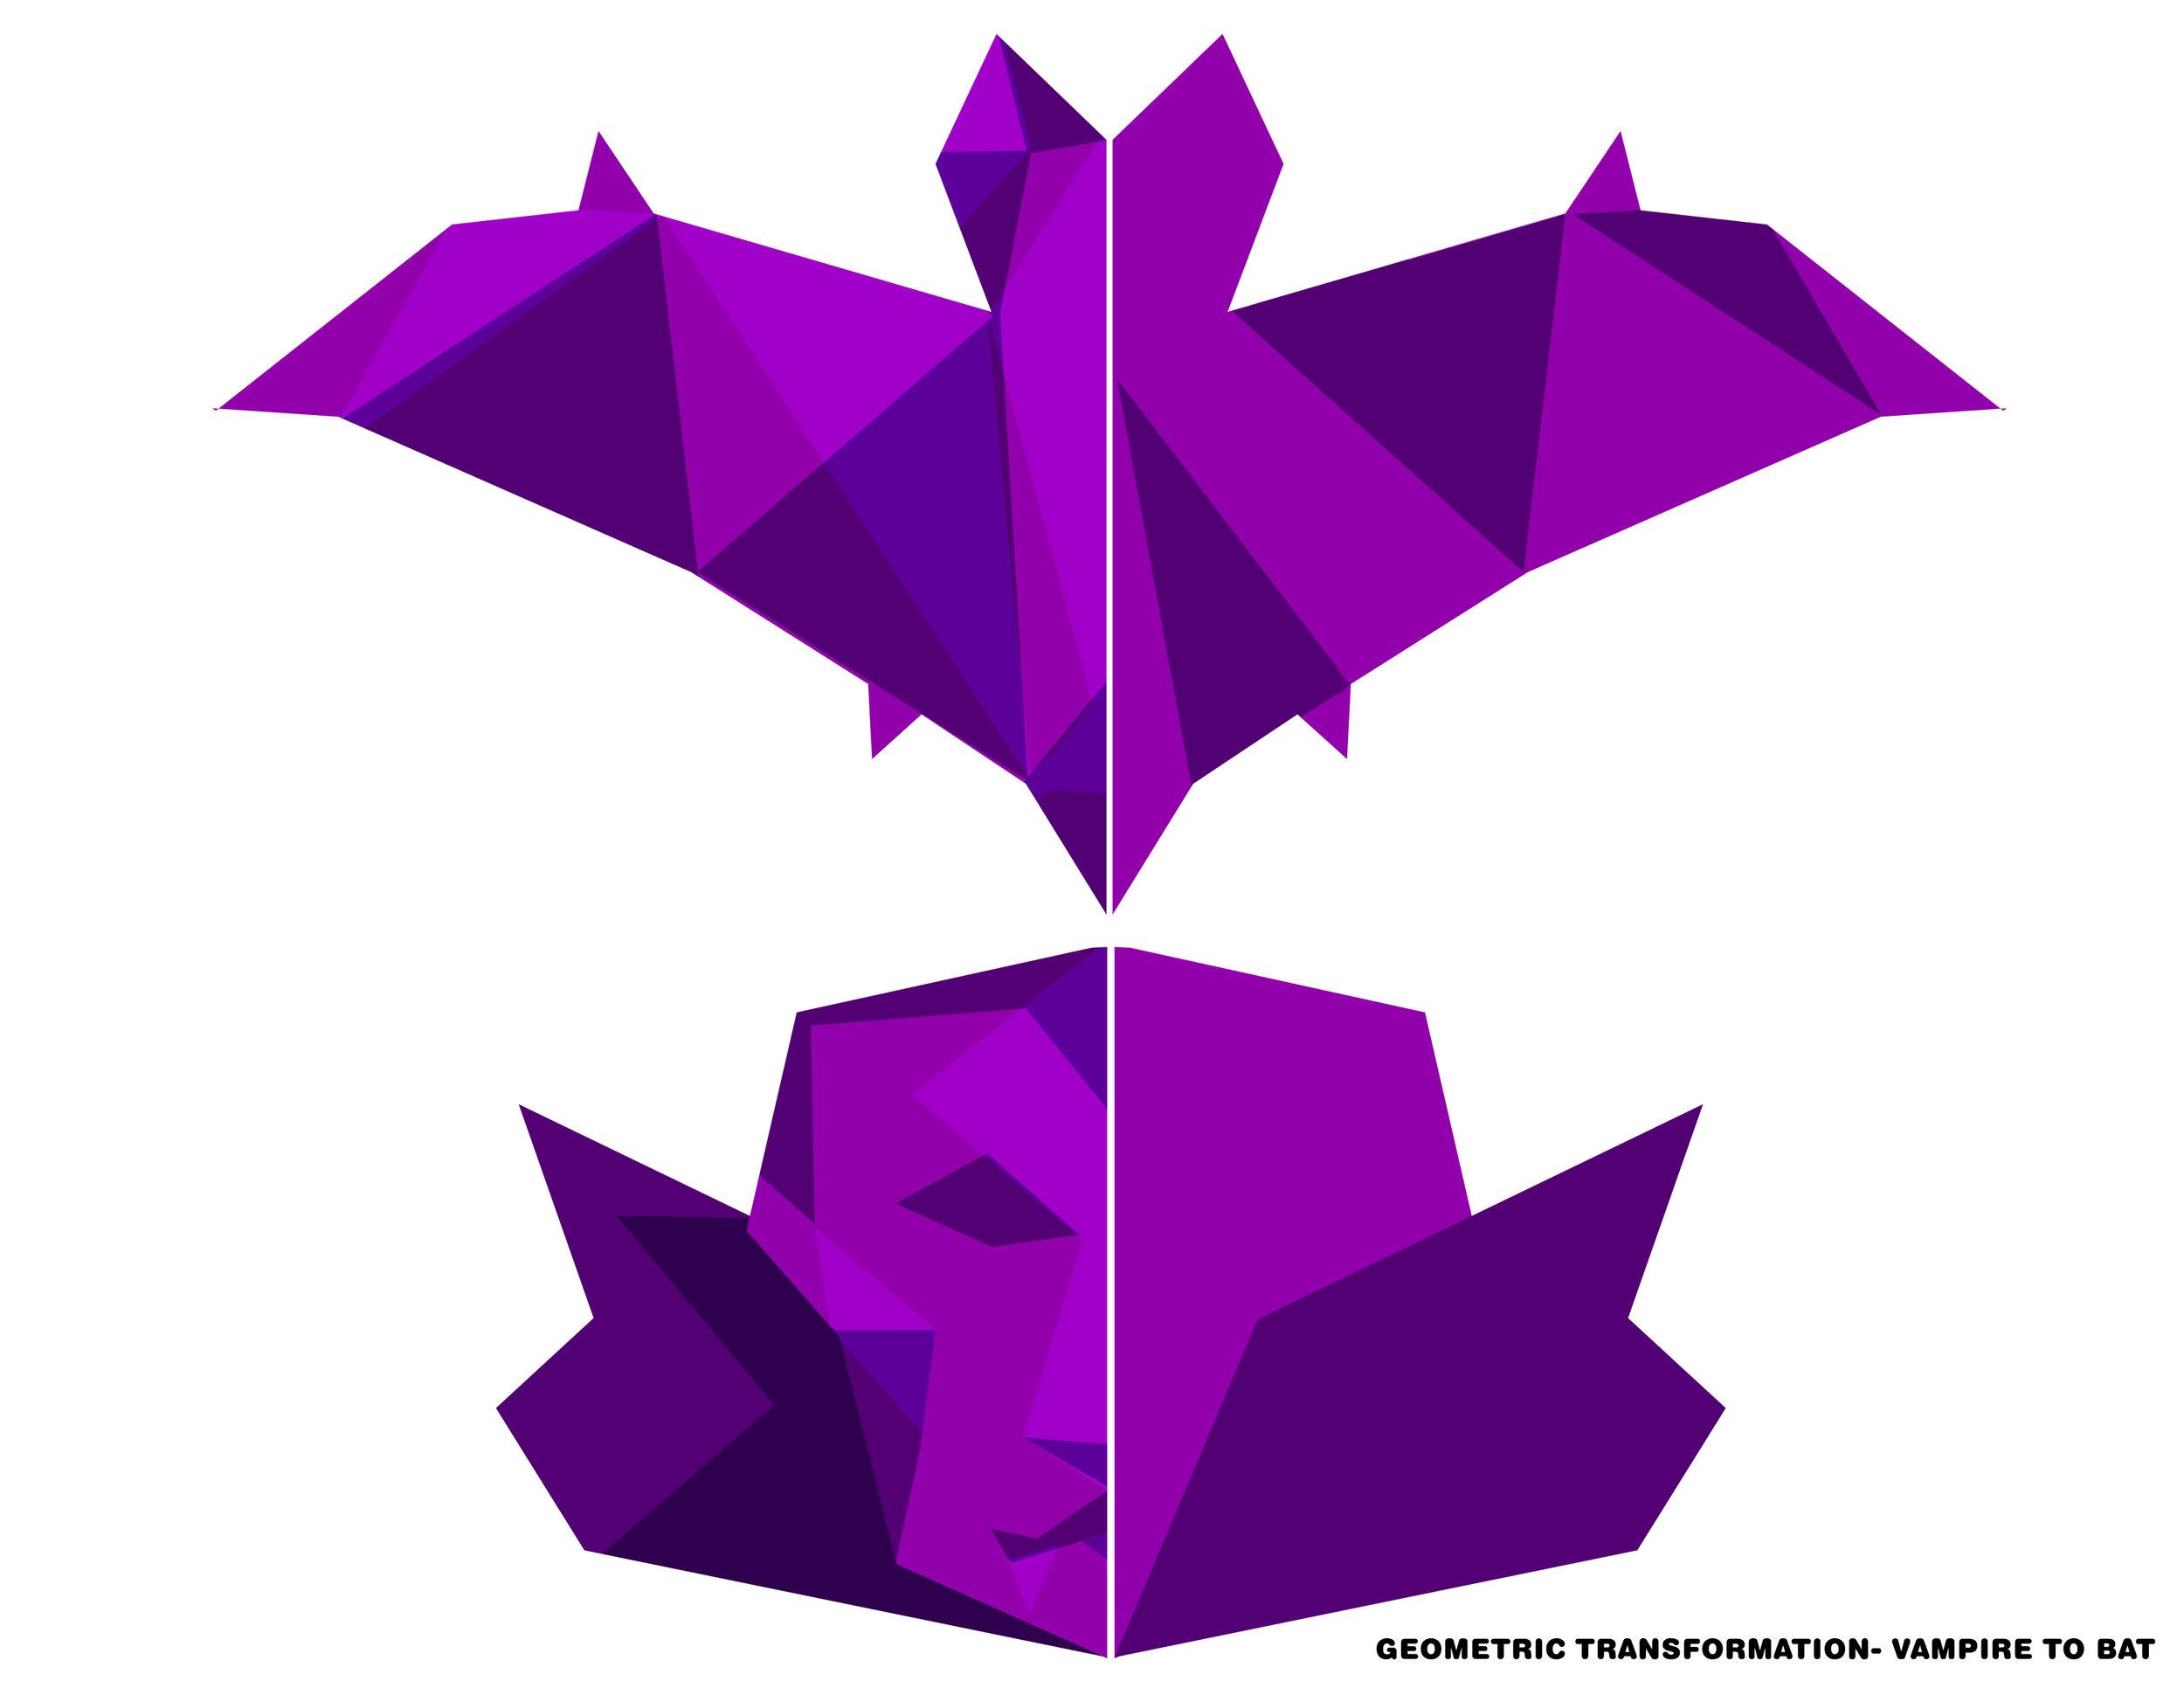 Halloween geometric transformation concept